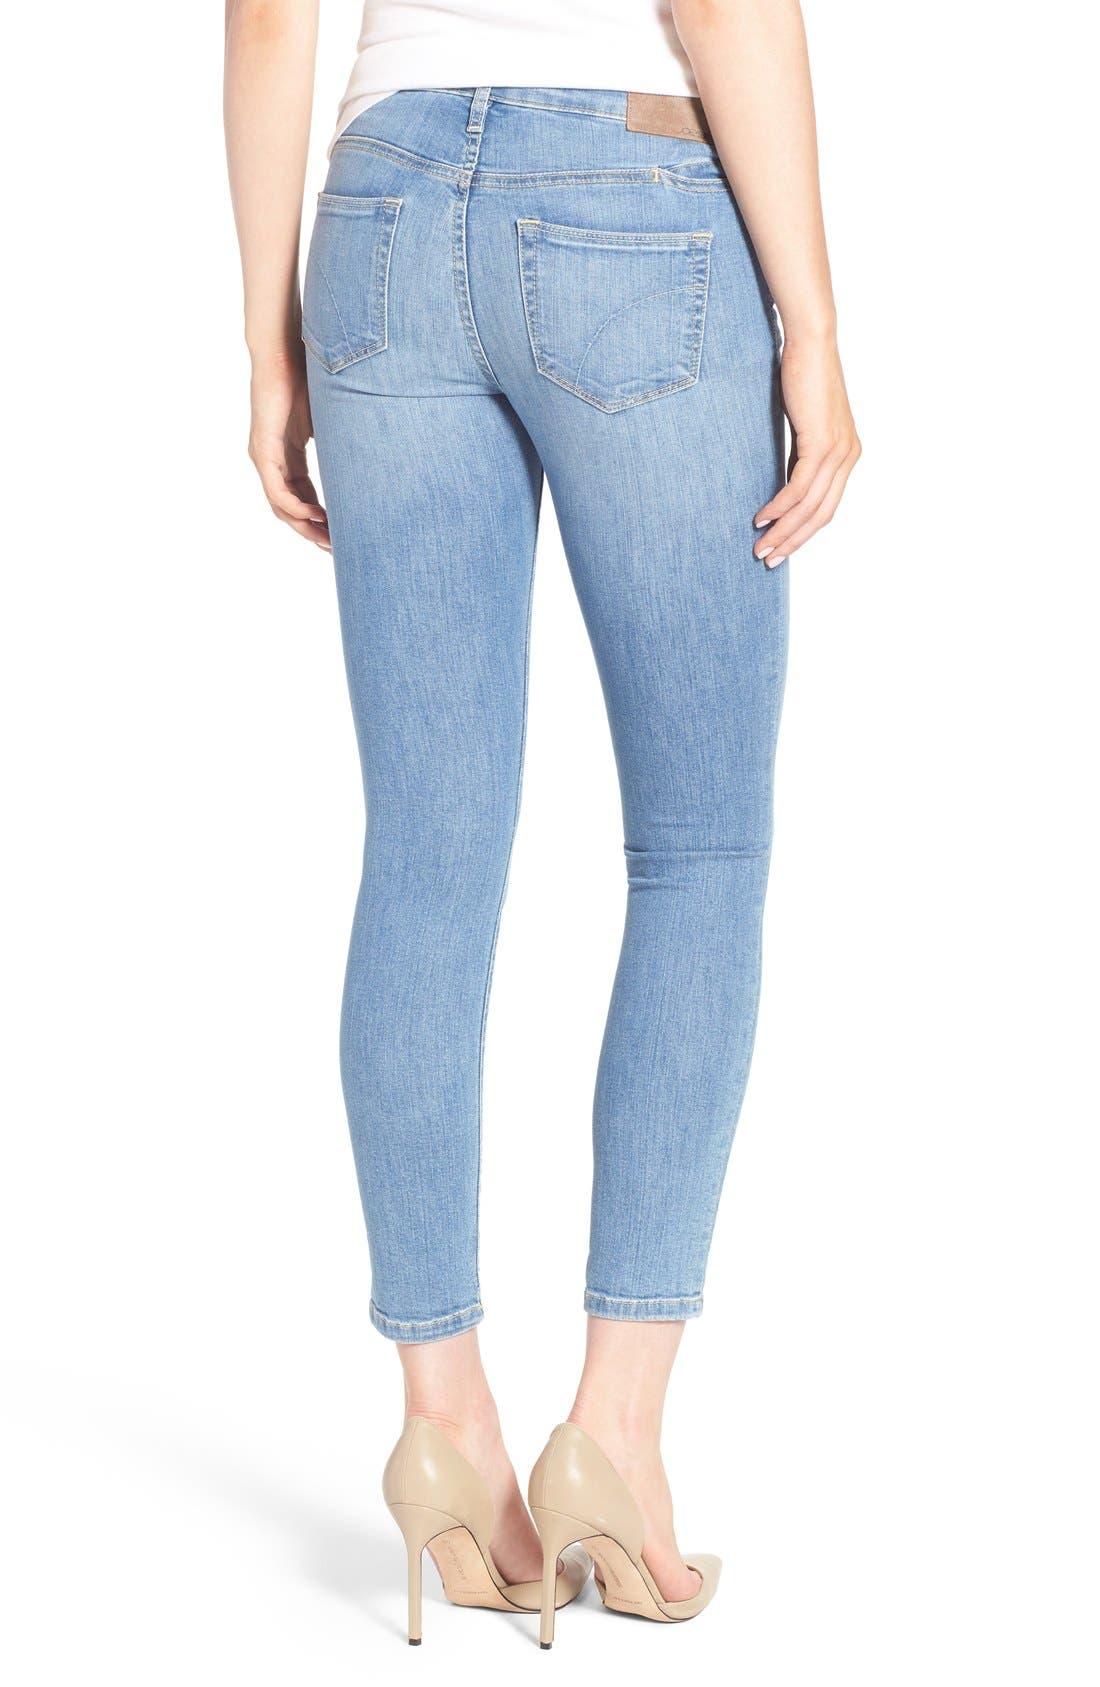 Alternate Image 2  - Joe's 'Vixen' Ankle Skinny Jeans with Phone Pocket (Mitzi)